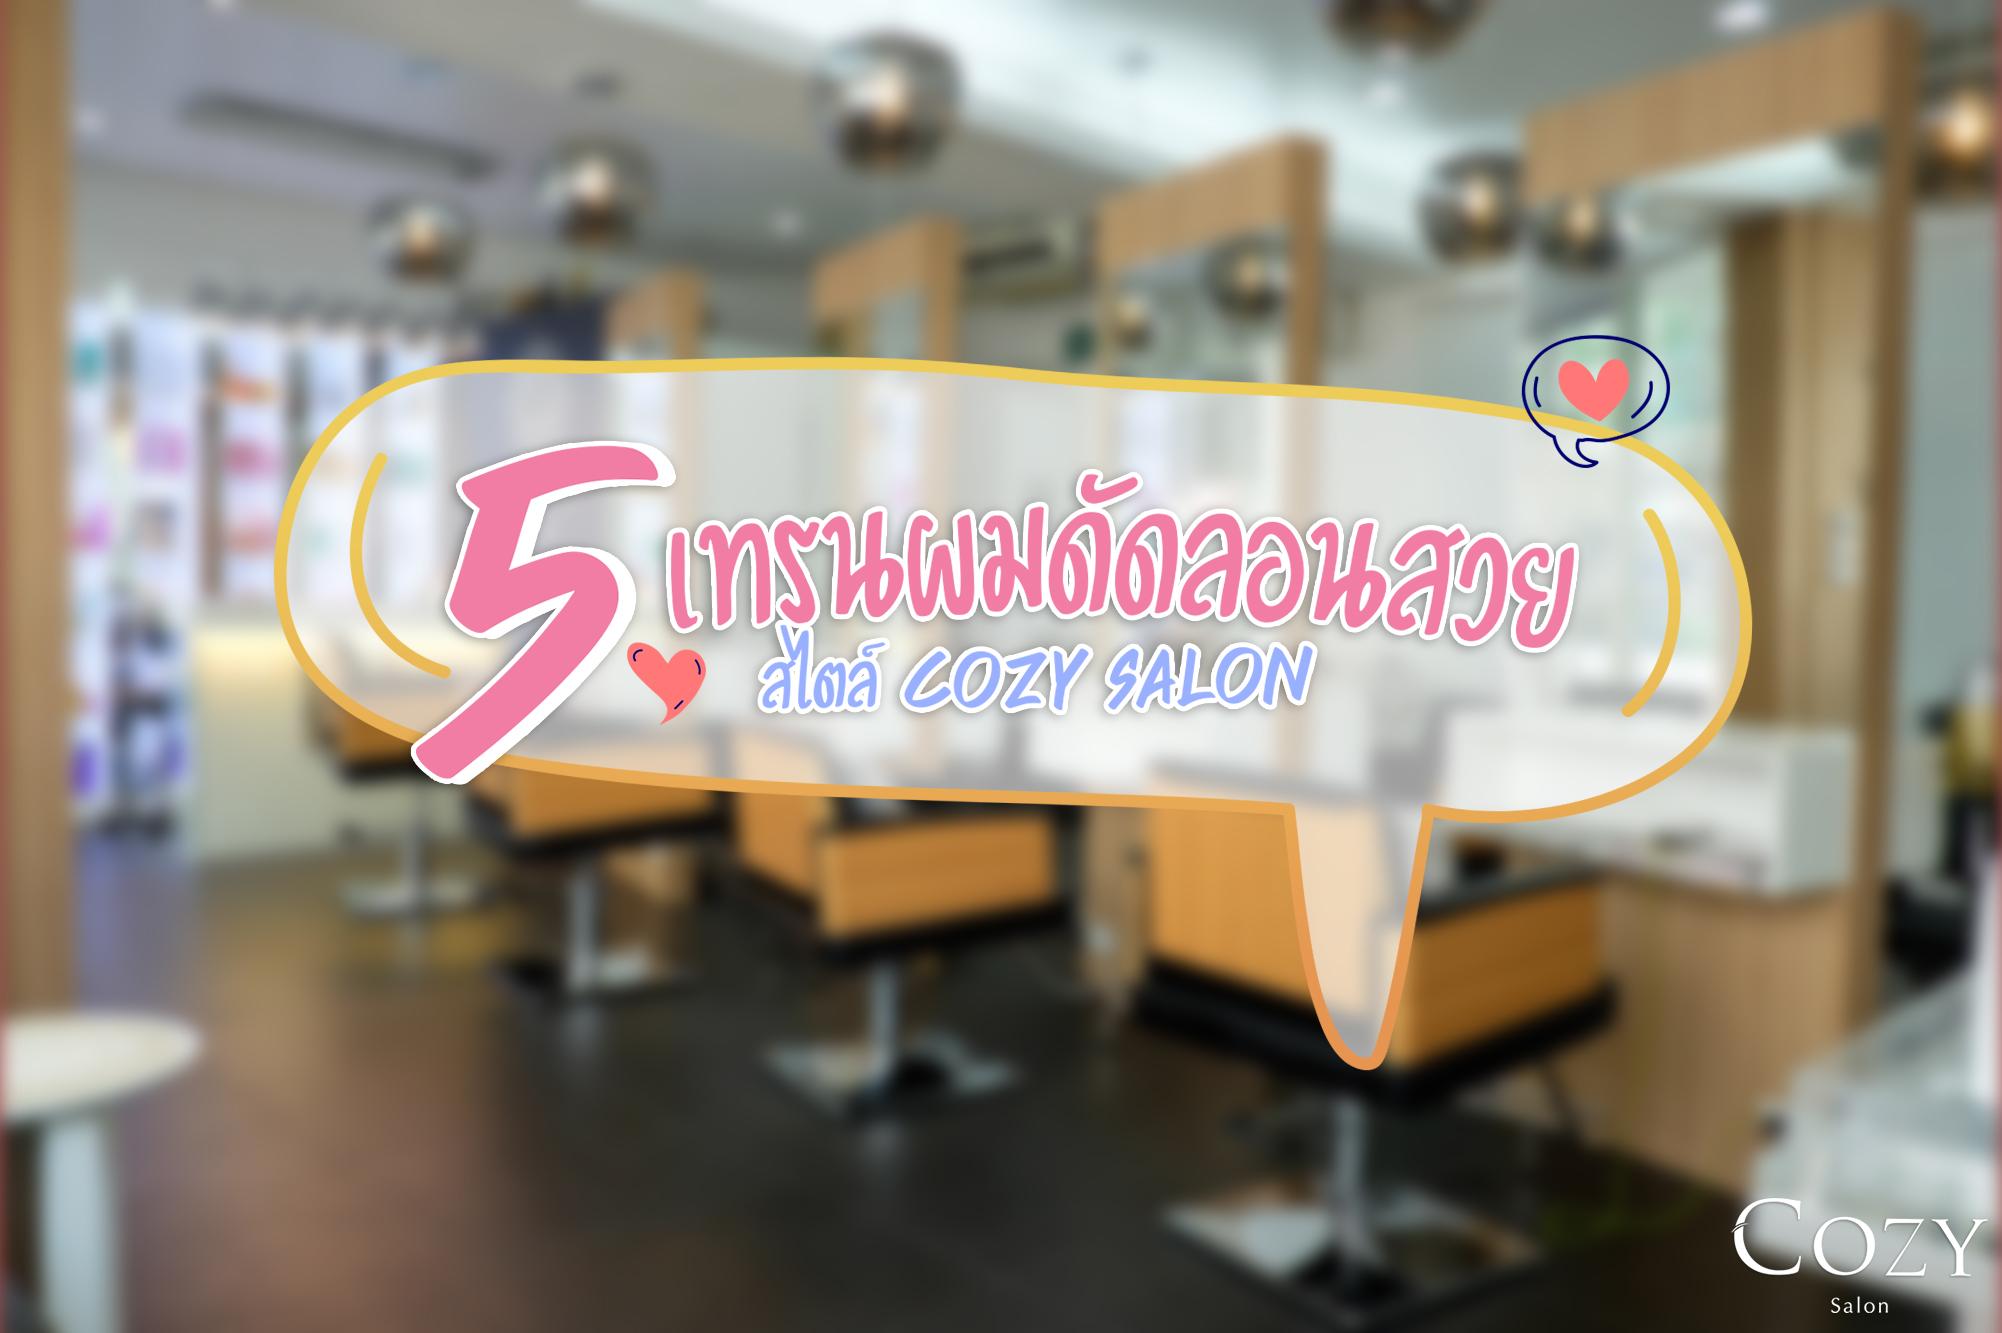 Cozy Salon 8th anniversary - promotion